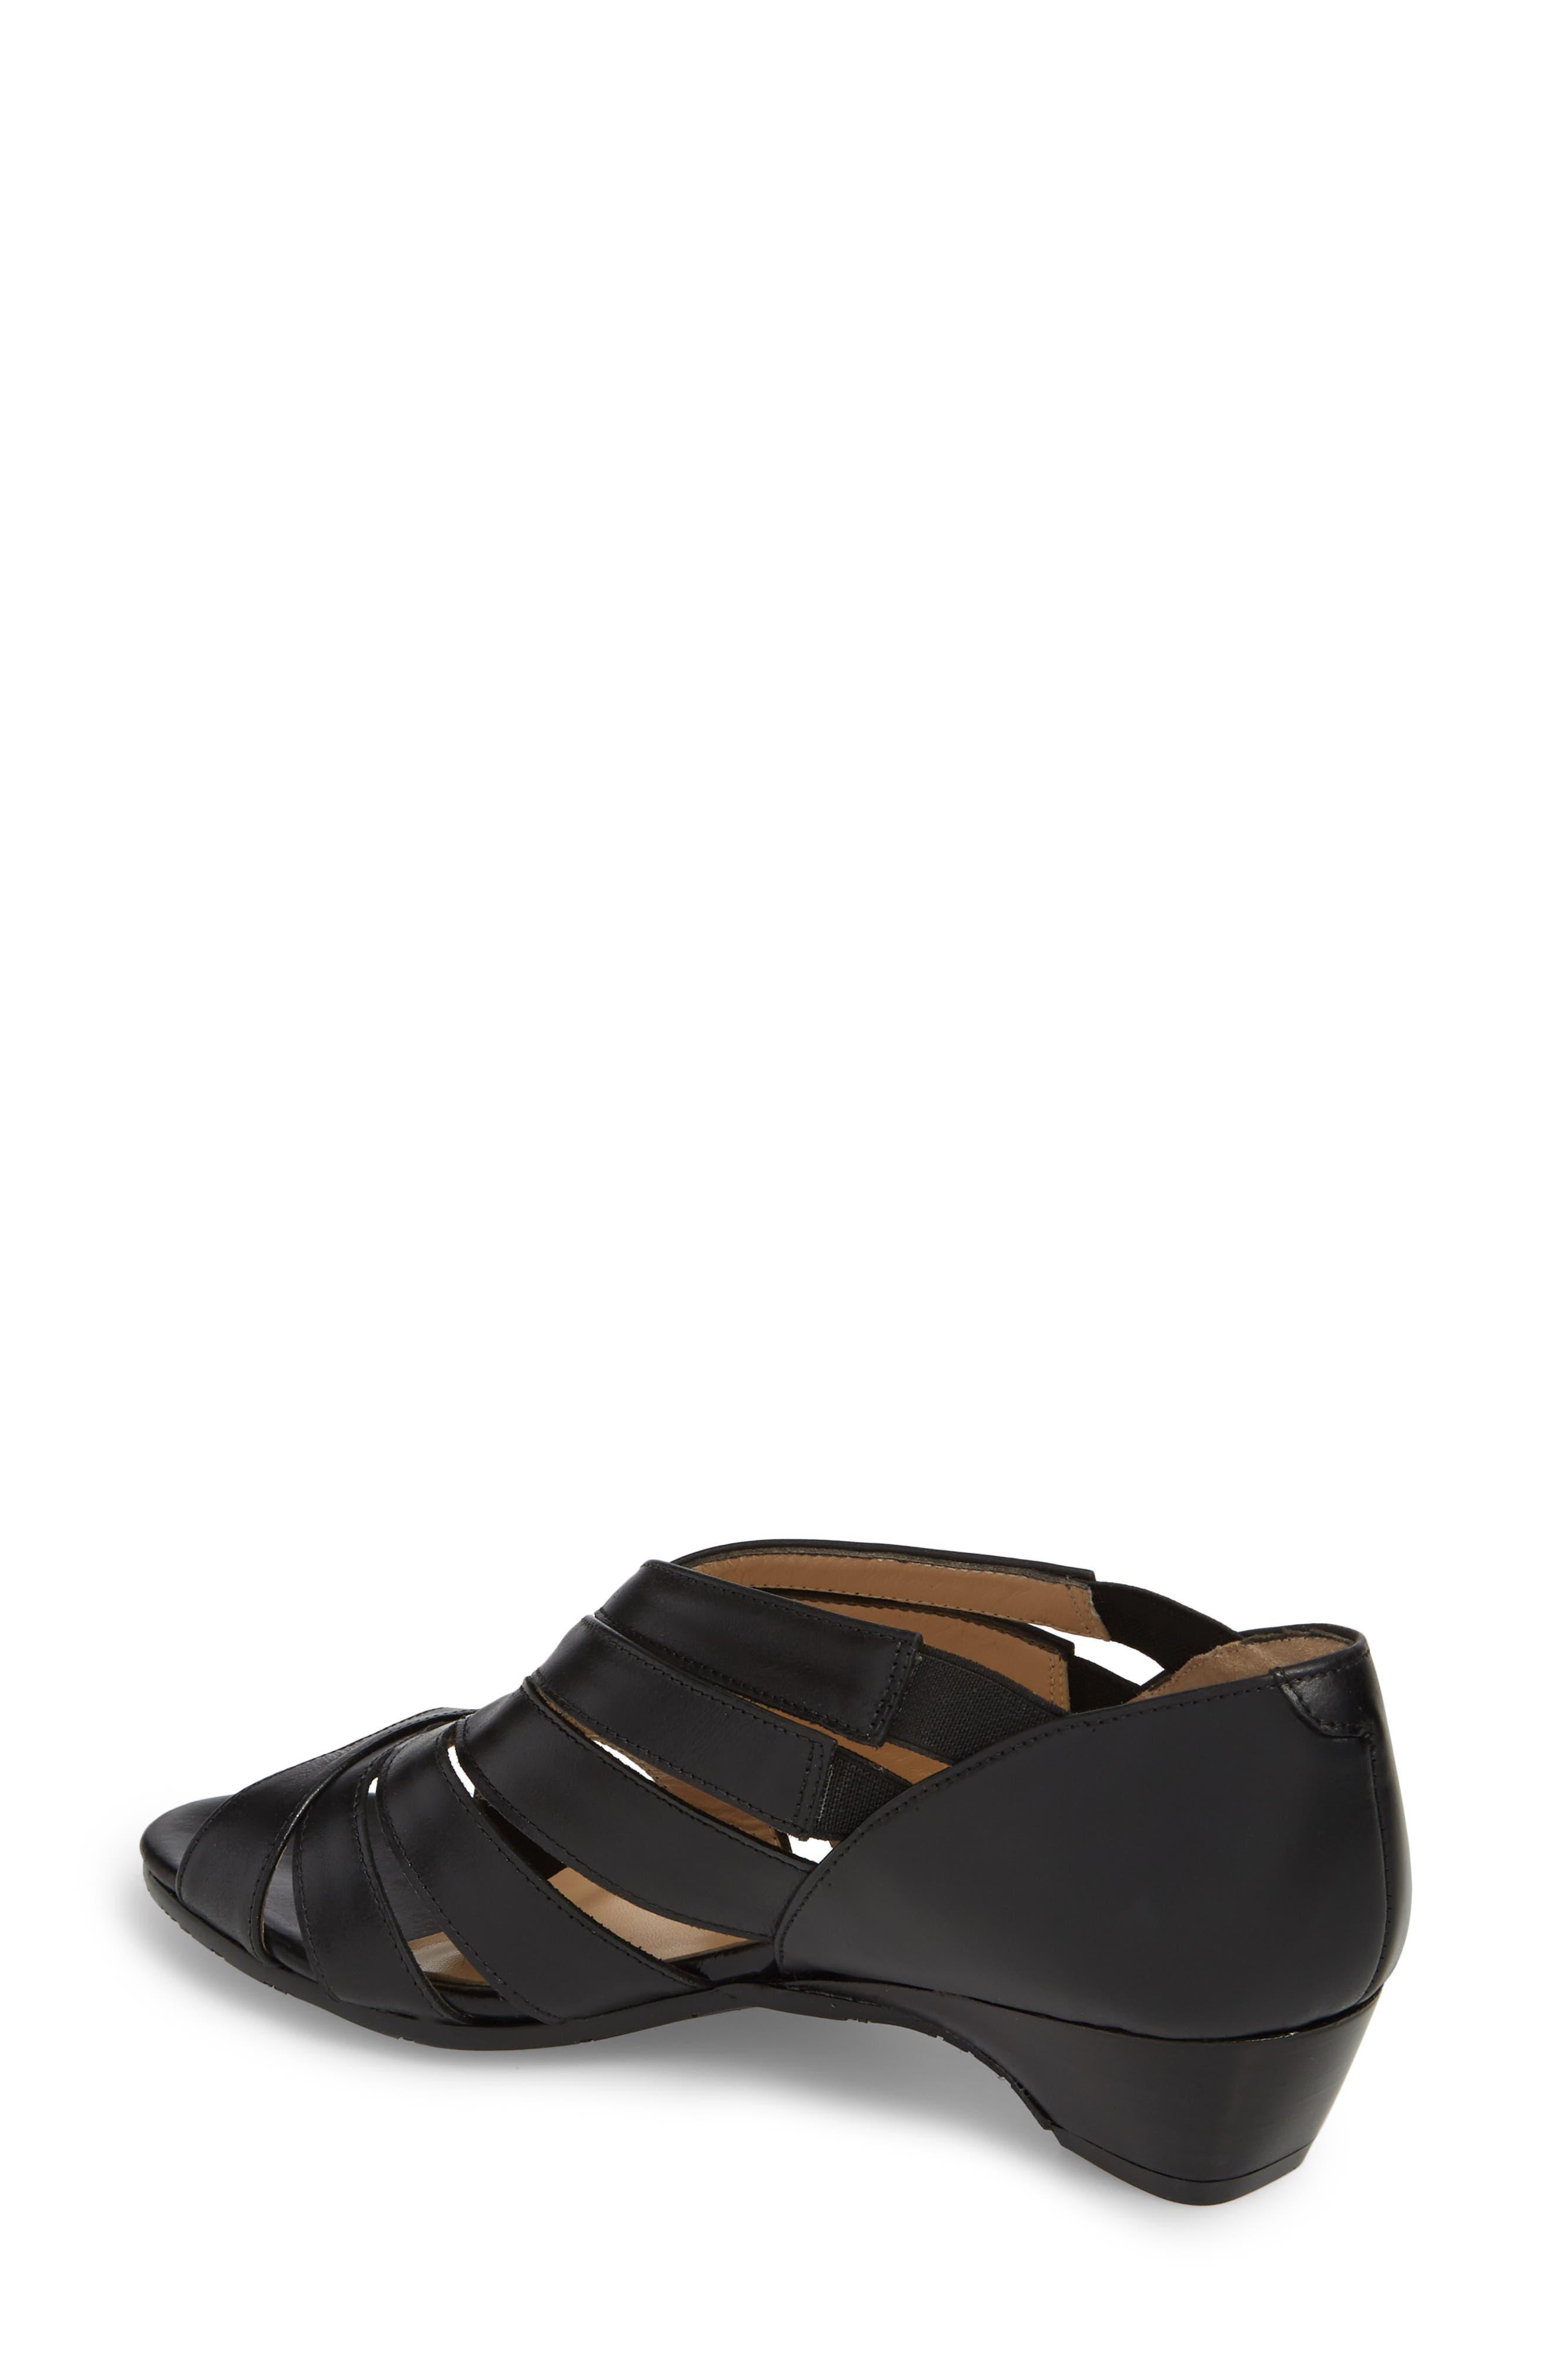 Demetra Sandal,                             Alternate thumbnail 2, color,                             Black Leather